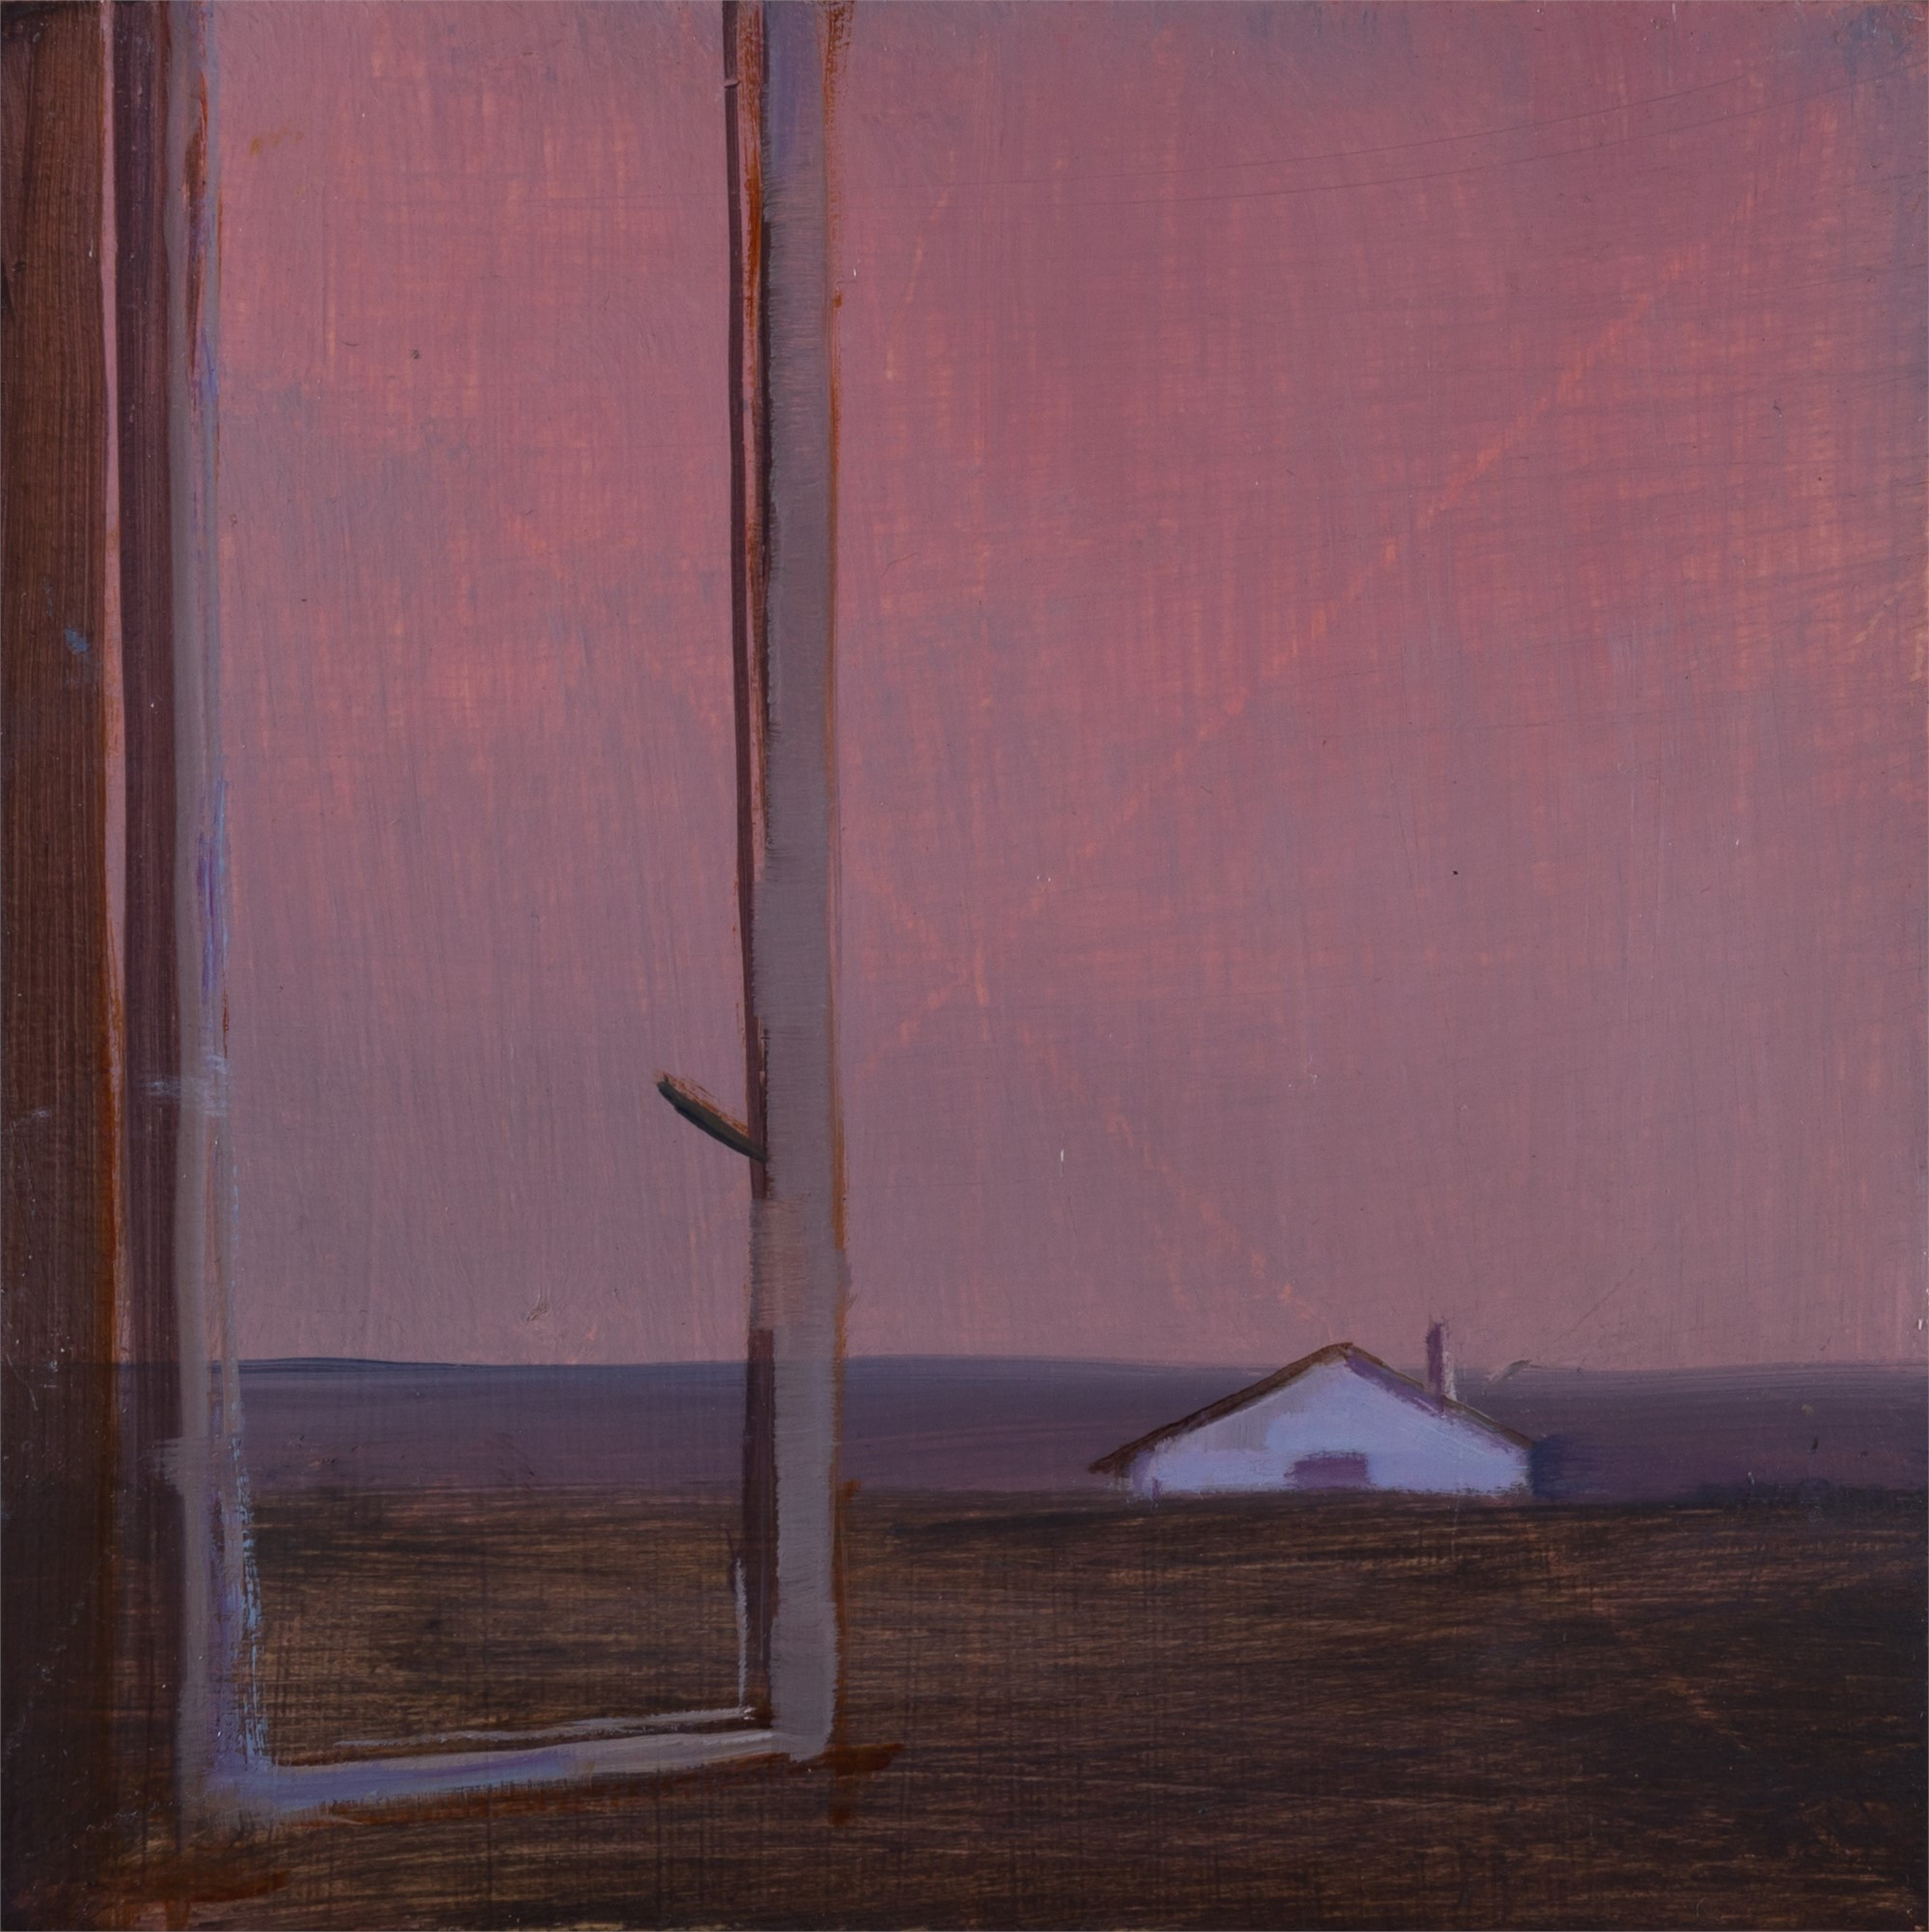 House Window by Hiroshi Sato